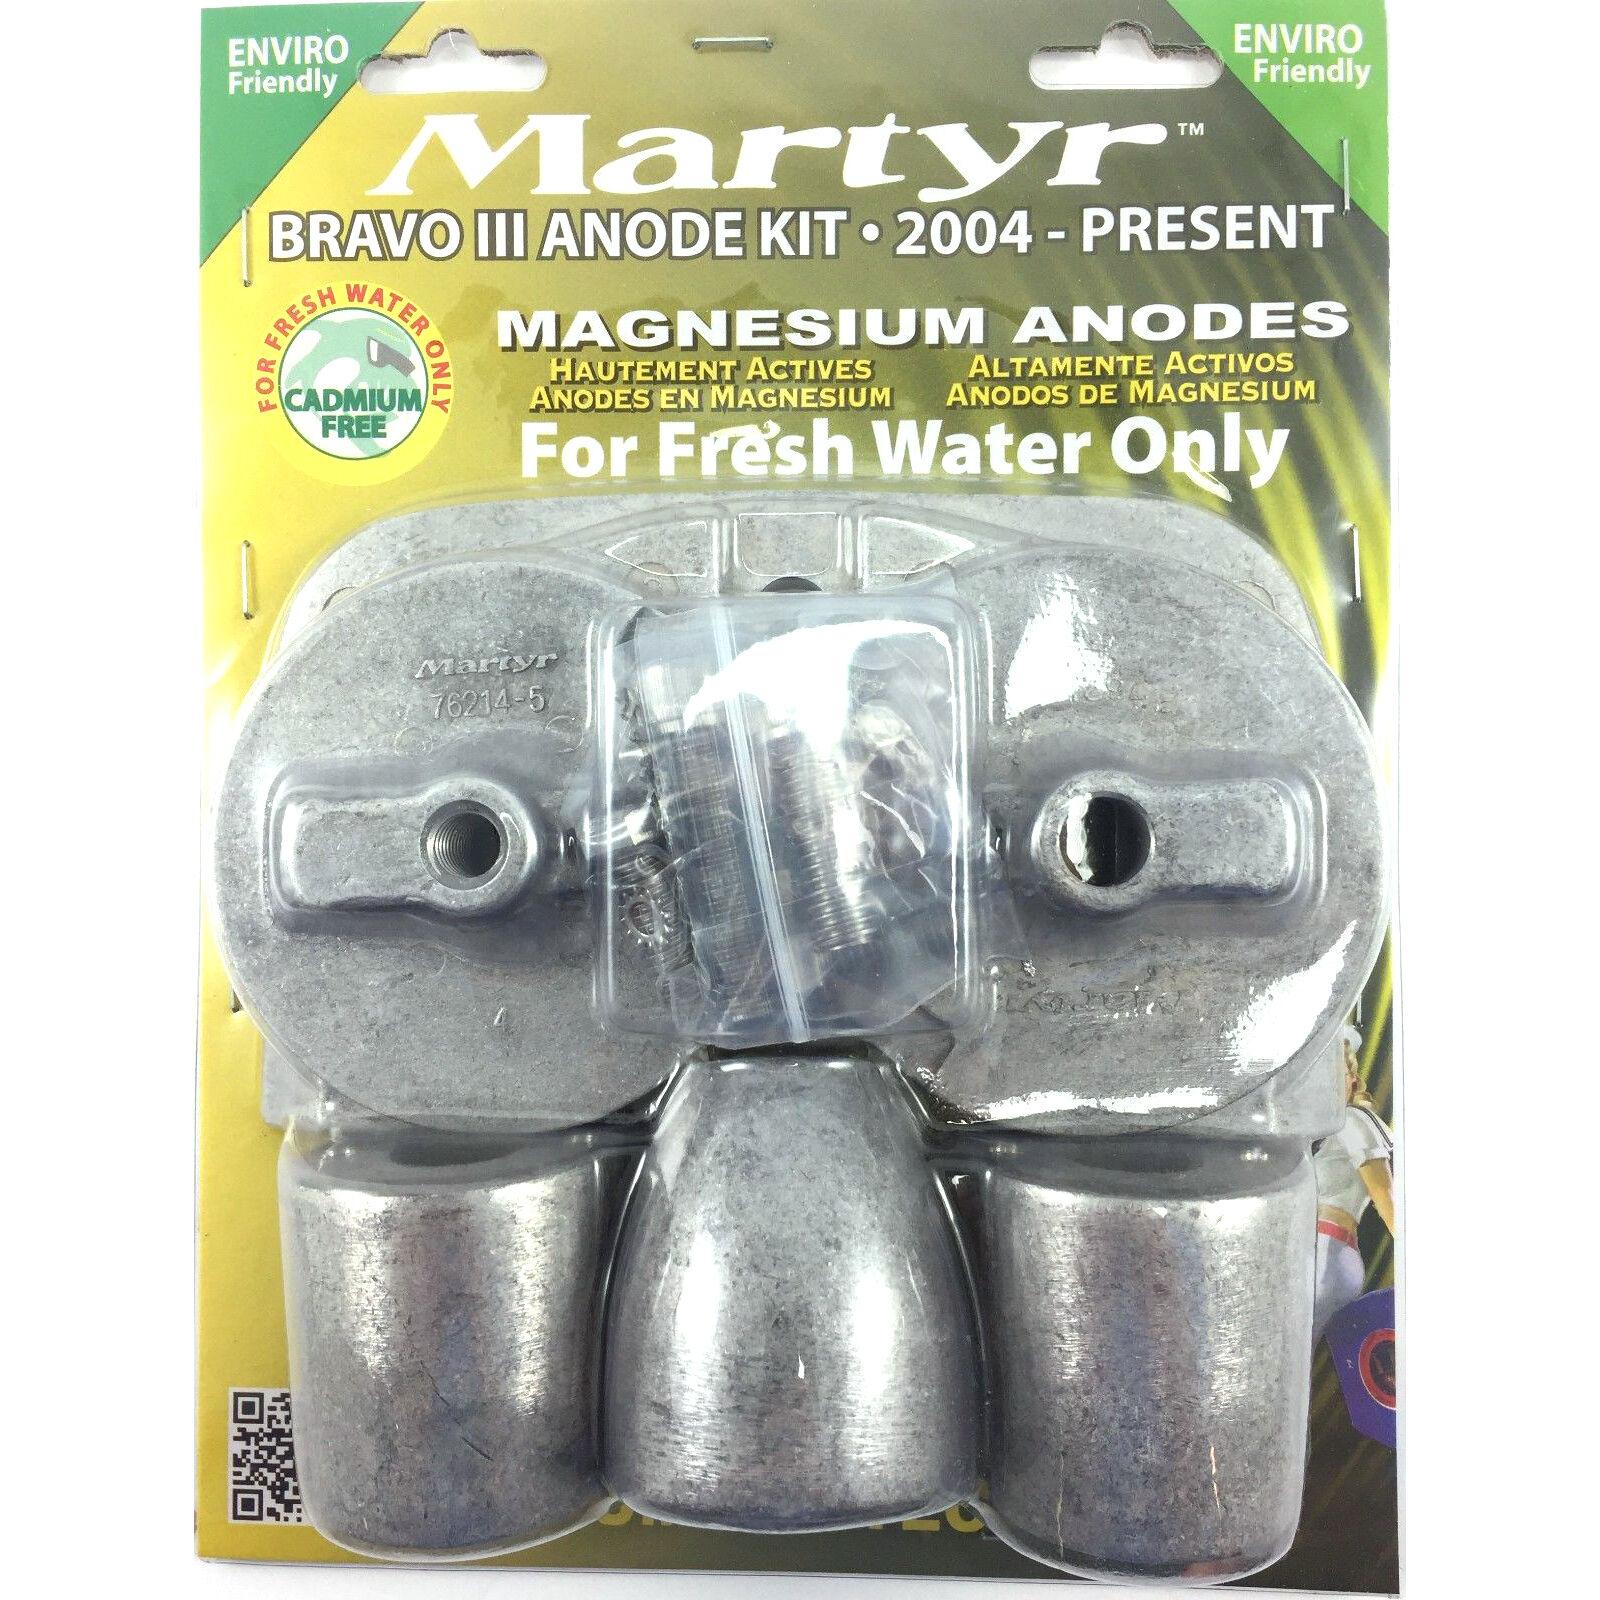 MerCruiser Anode Kit Bravo III 2004-Present - CMBRAVO3KITM Magnesium